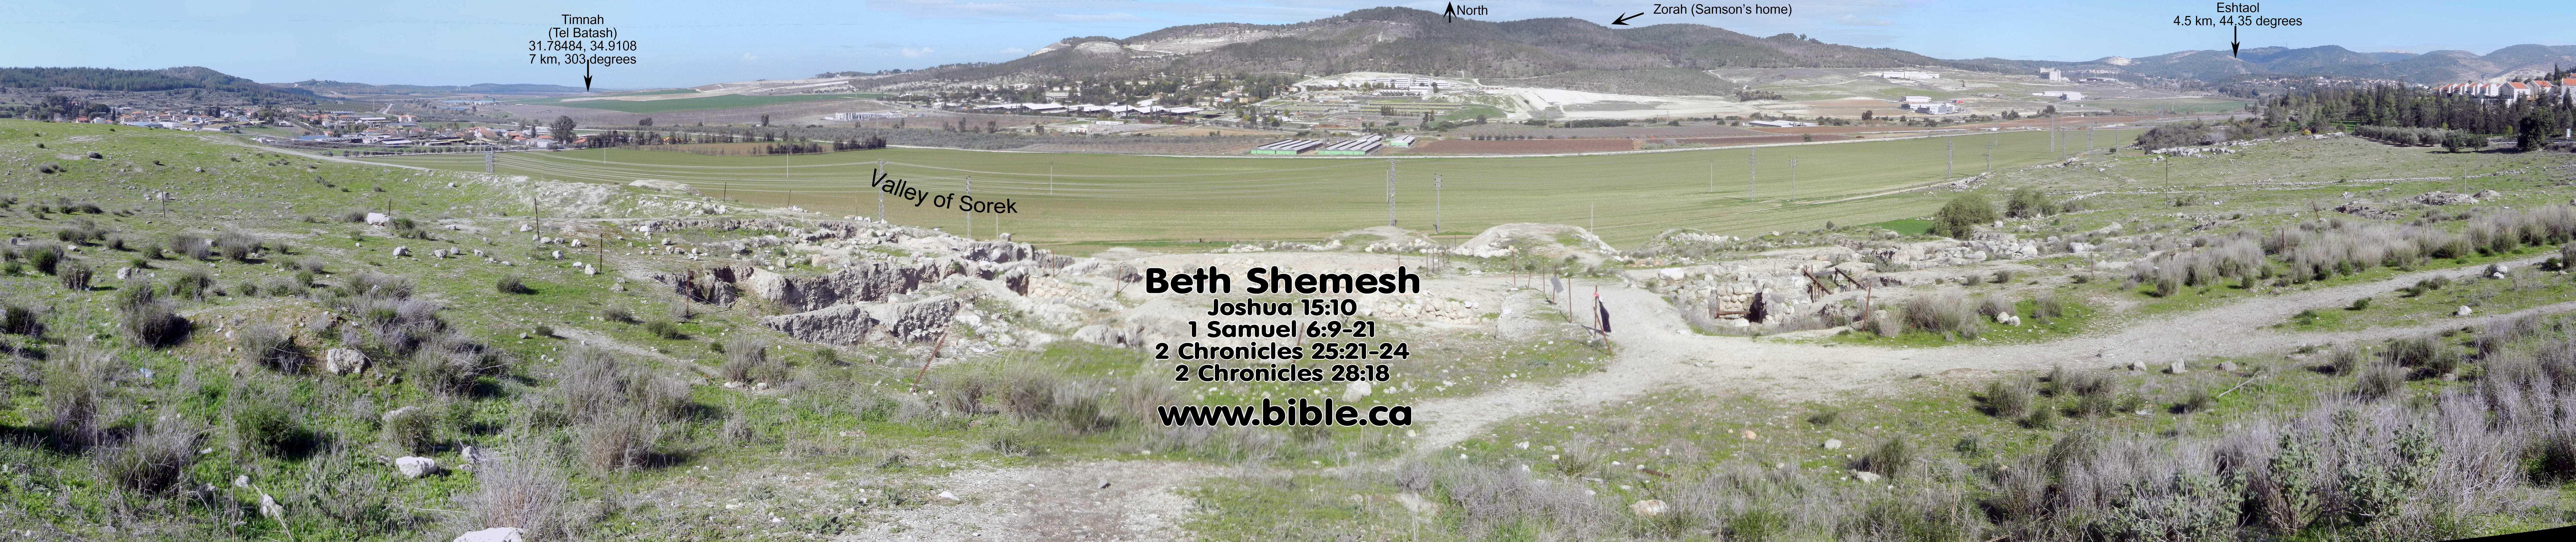 Beth Shemesh Judah: Jewish Messianic Expectation In The Dead Sea Scrolls: Luke